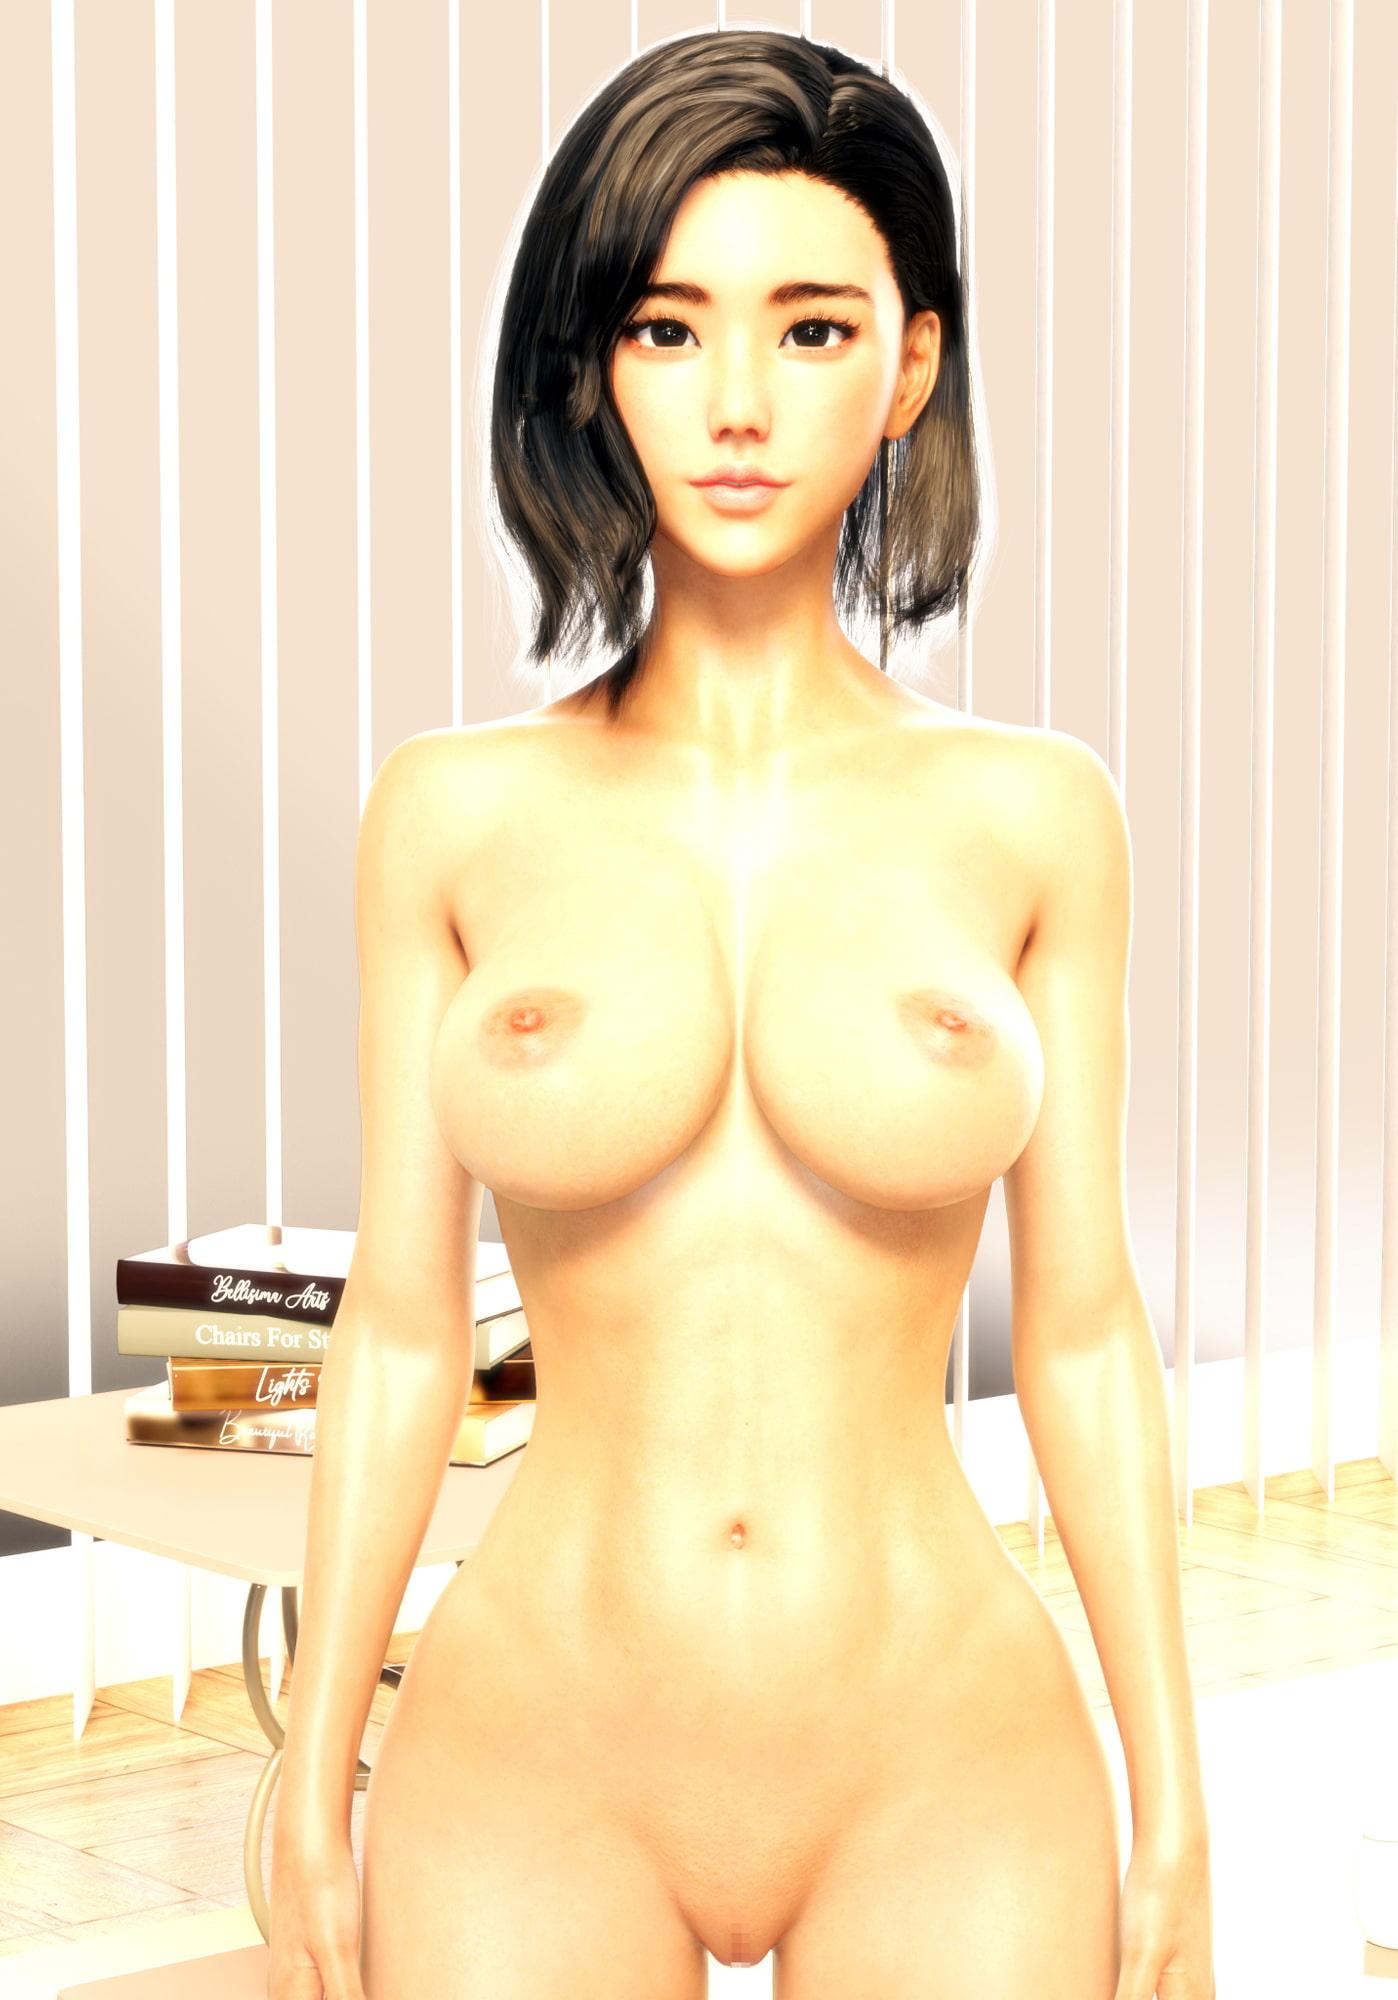 3DCGヌード集 美女ノ肉体 雫編 超絶フォトリアル版